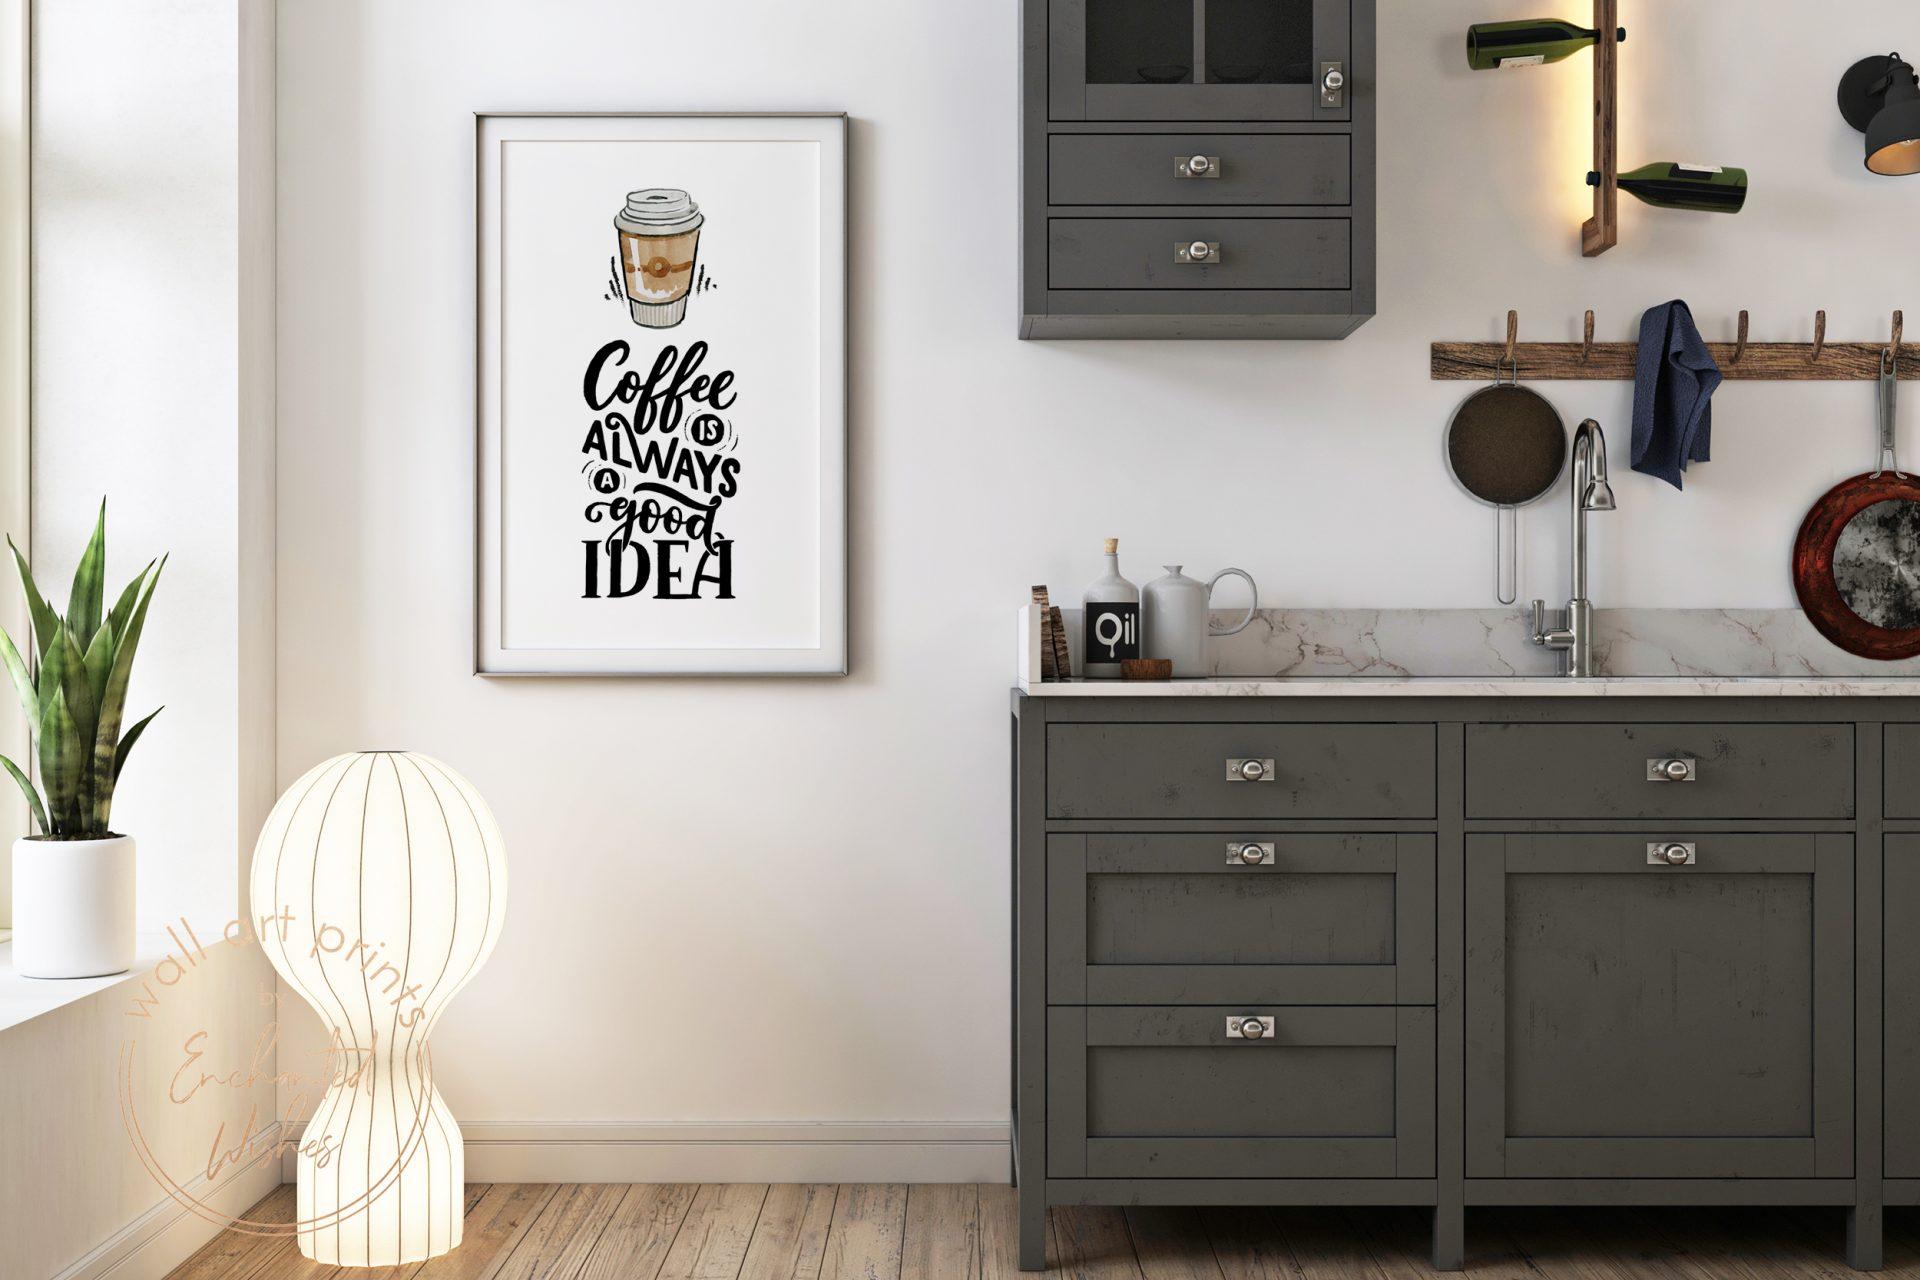 Coffee is always a good idea print